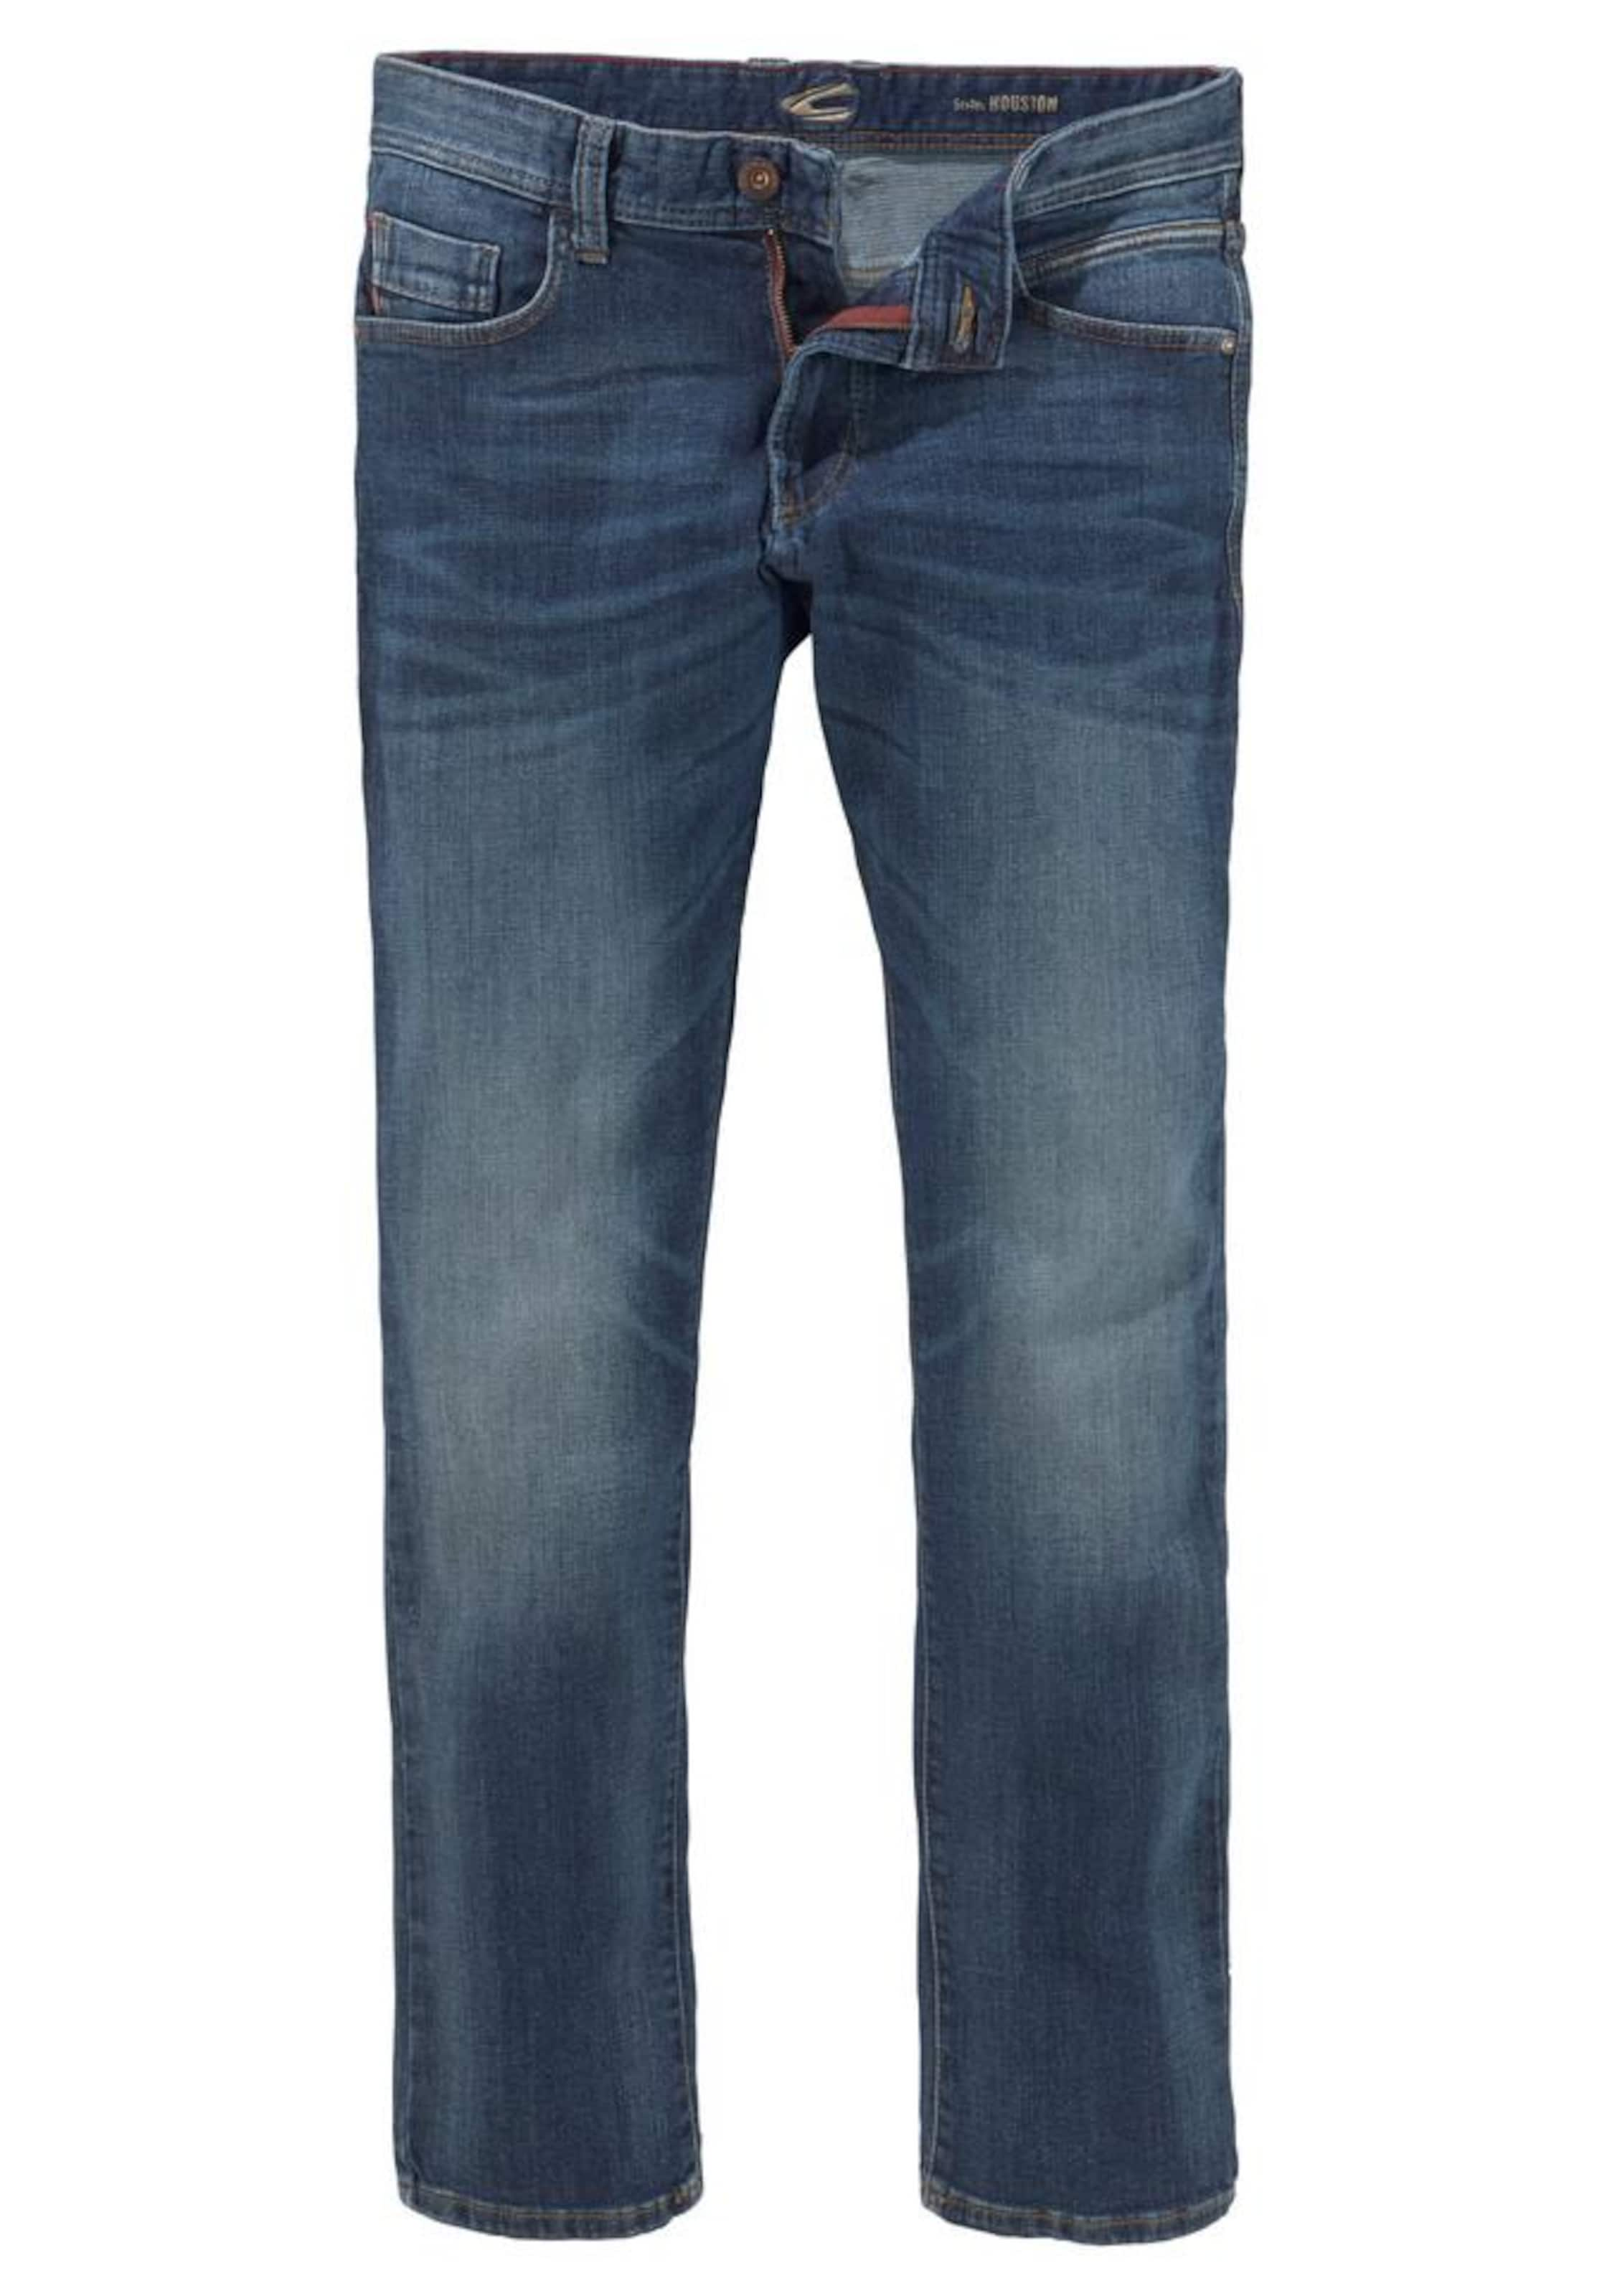 Active Camel Denim Jeans 'houston' In Blue AR354jL